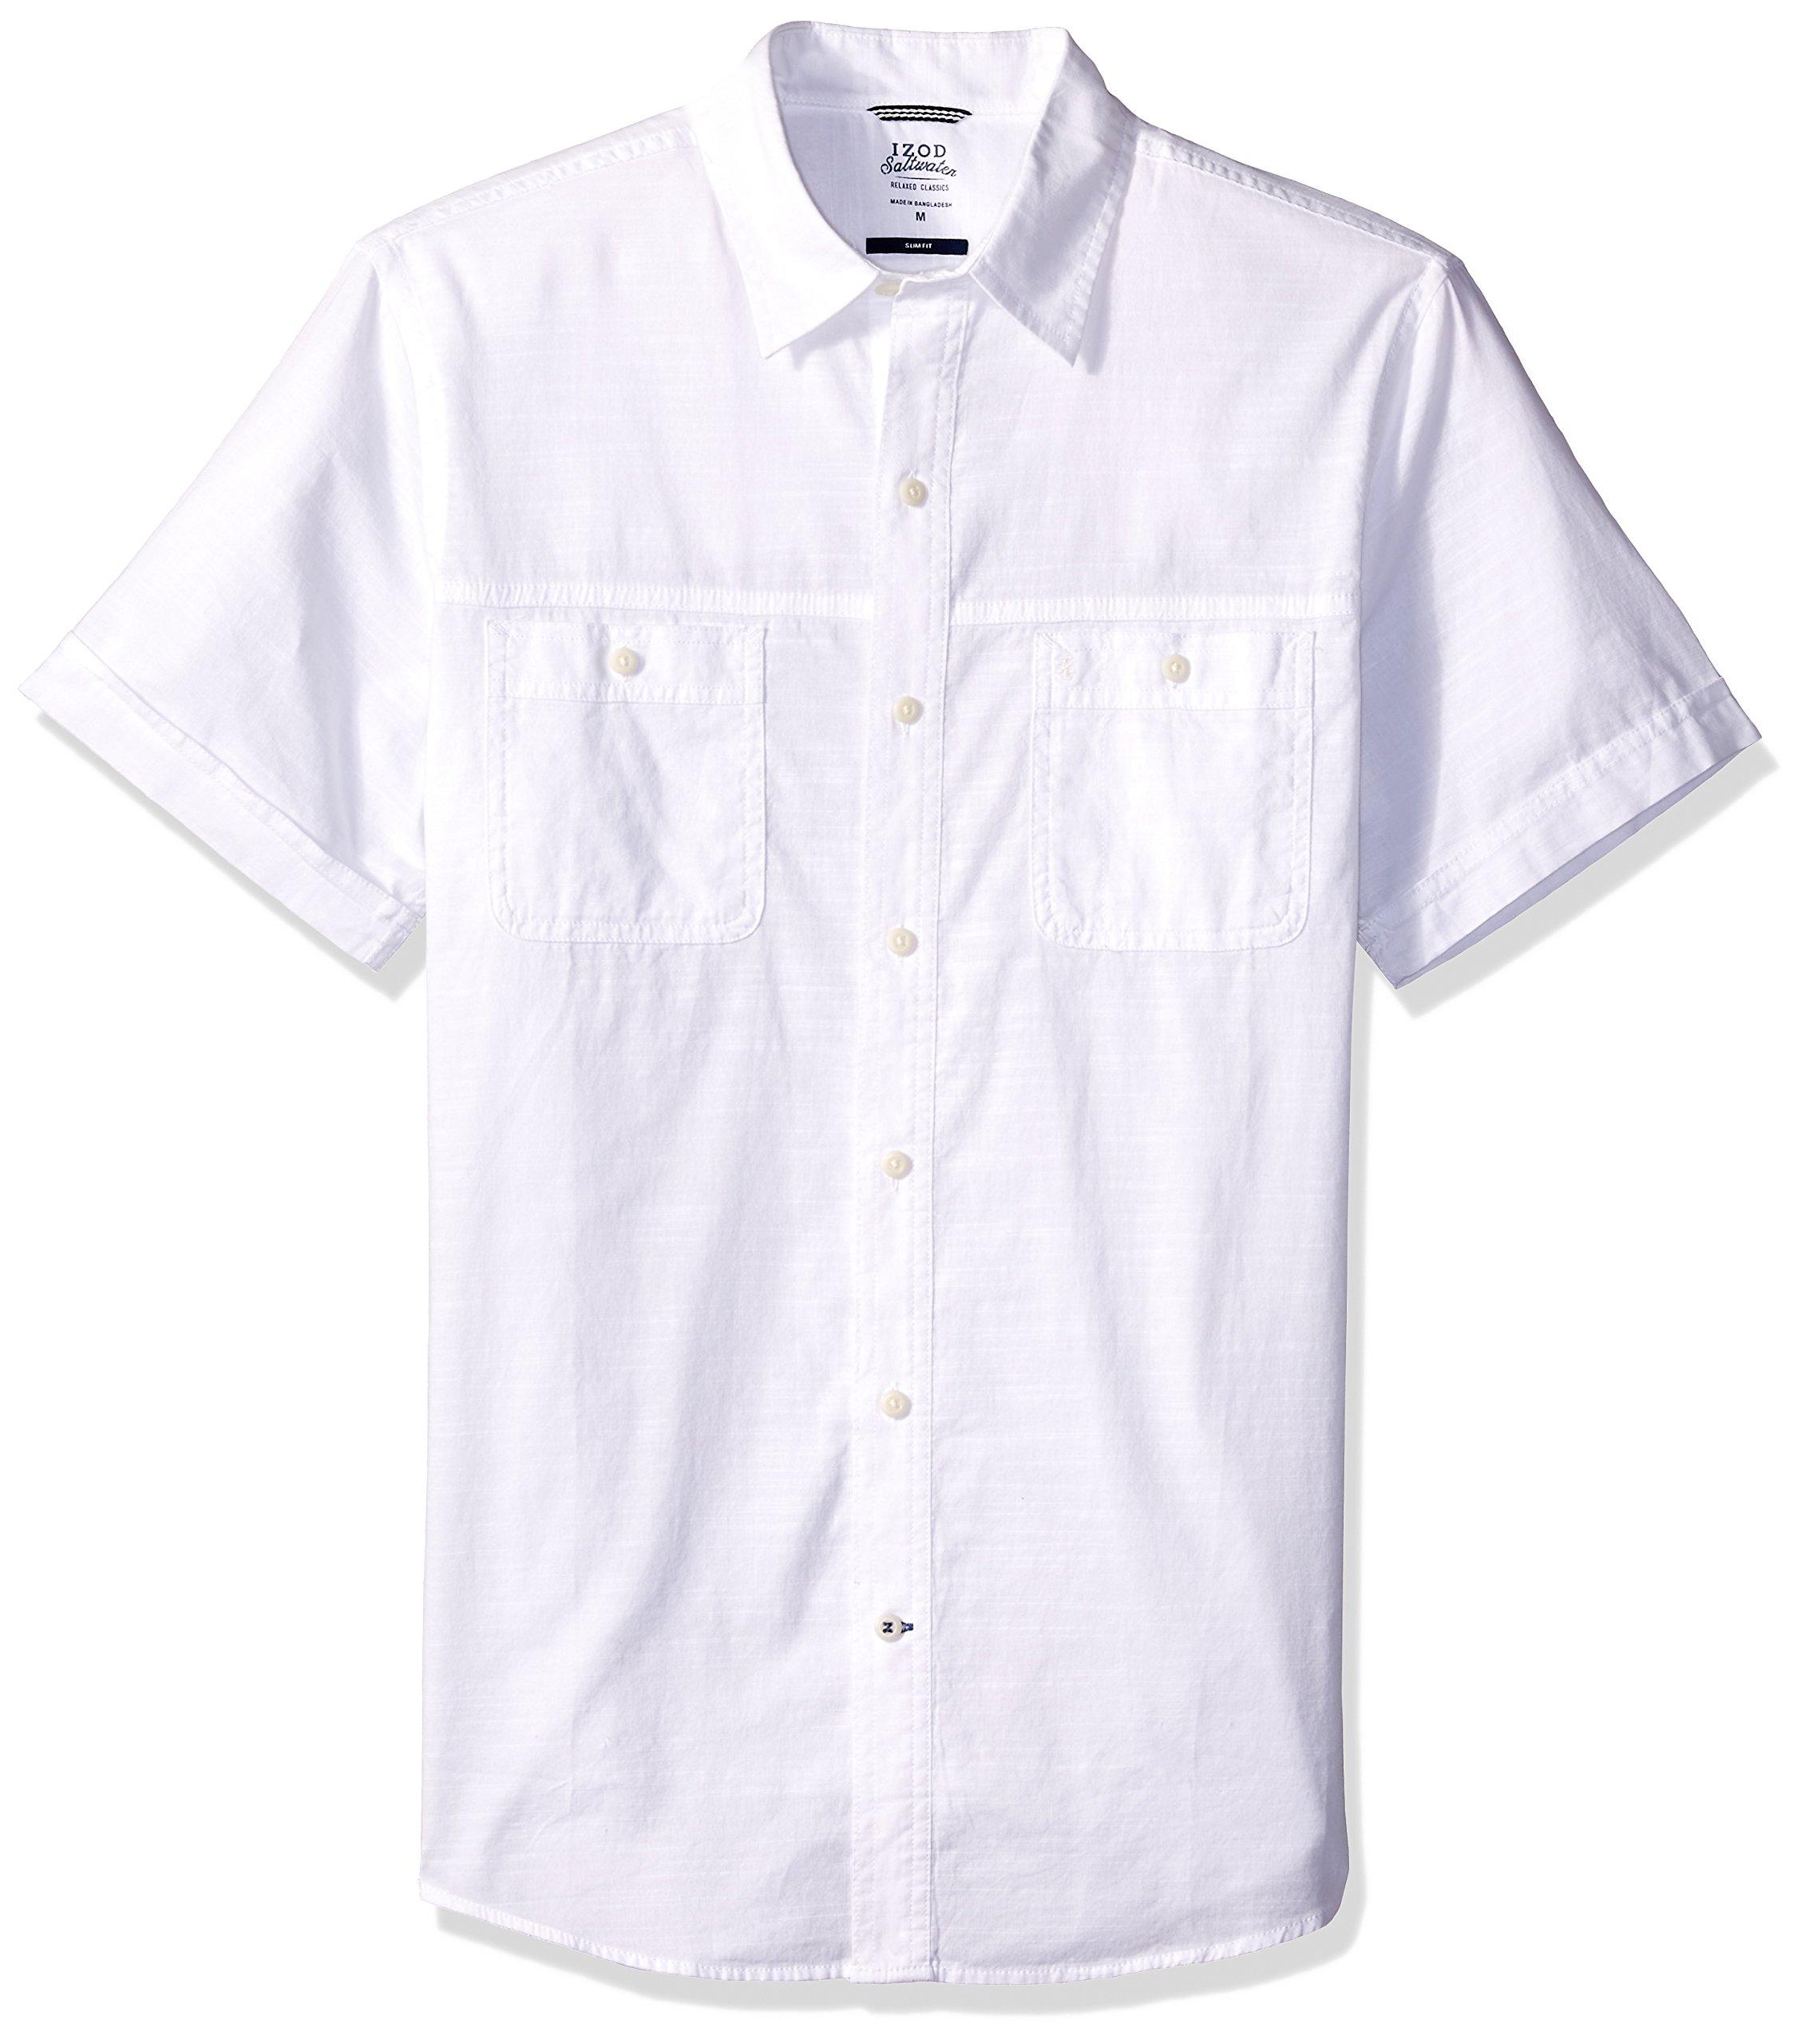 IZOD Men's Saltwater Dockside Chambray Solid Short Sleeve Shirt, Bright White, X-Large Slim